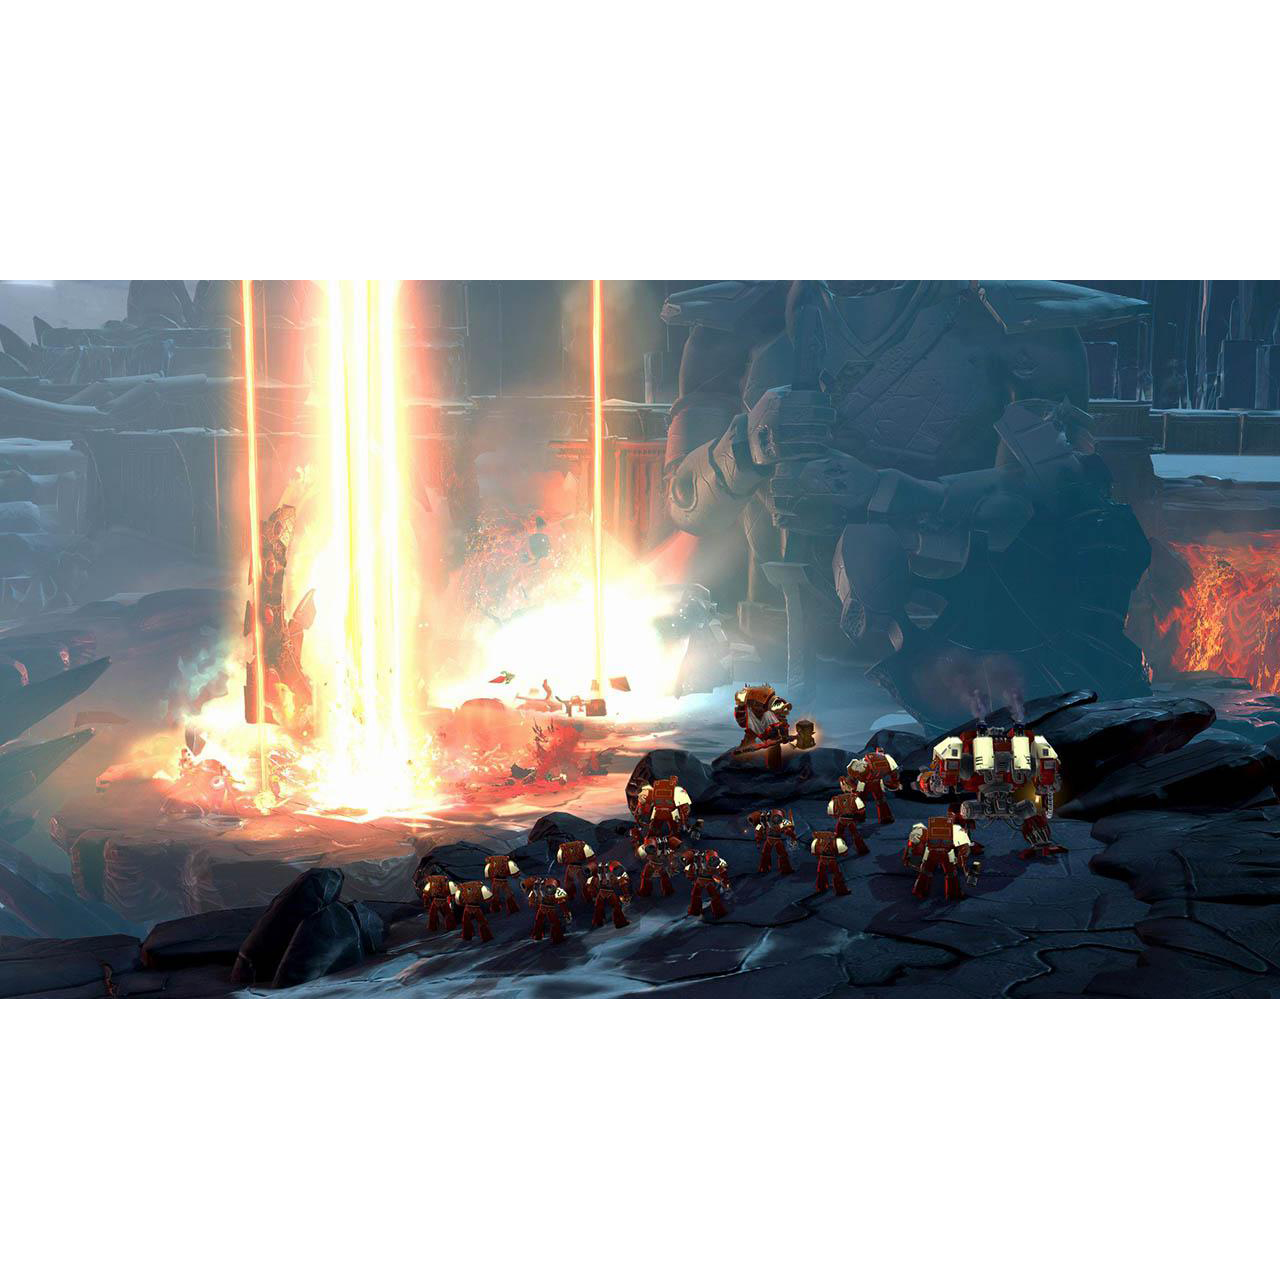 Joc Dawn of War 3 pentru PC 1